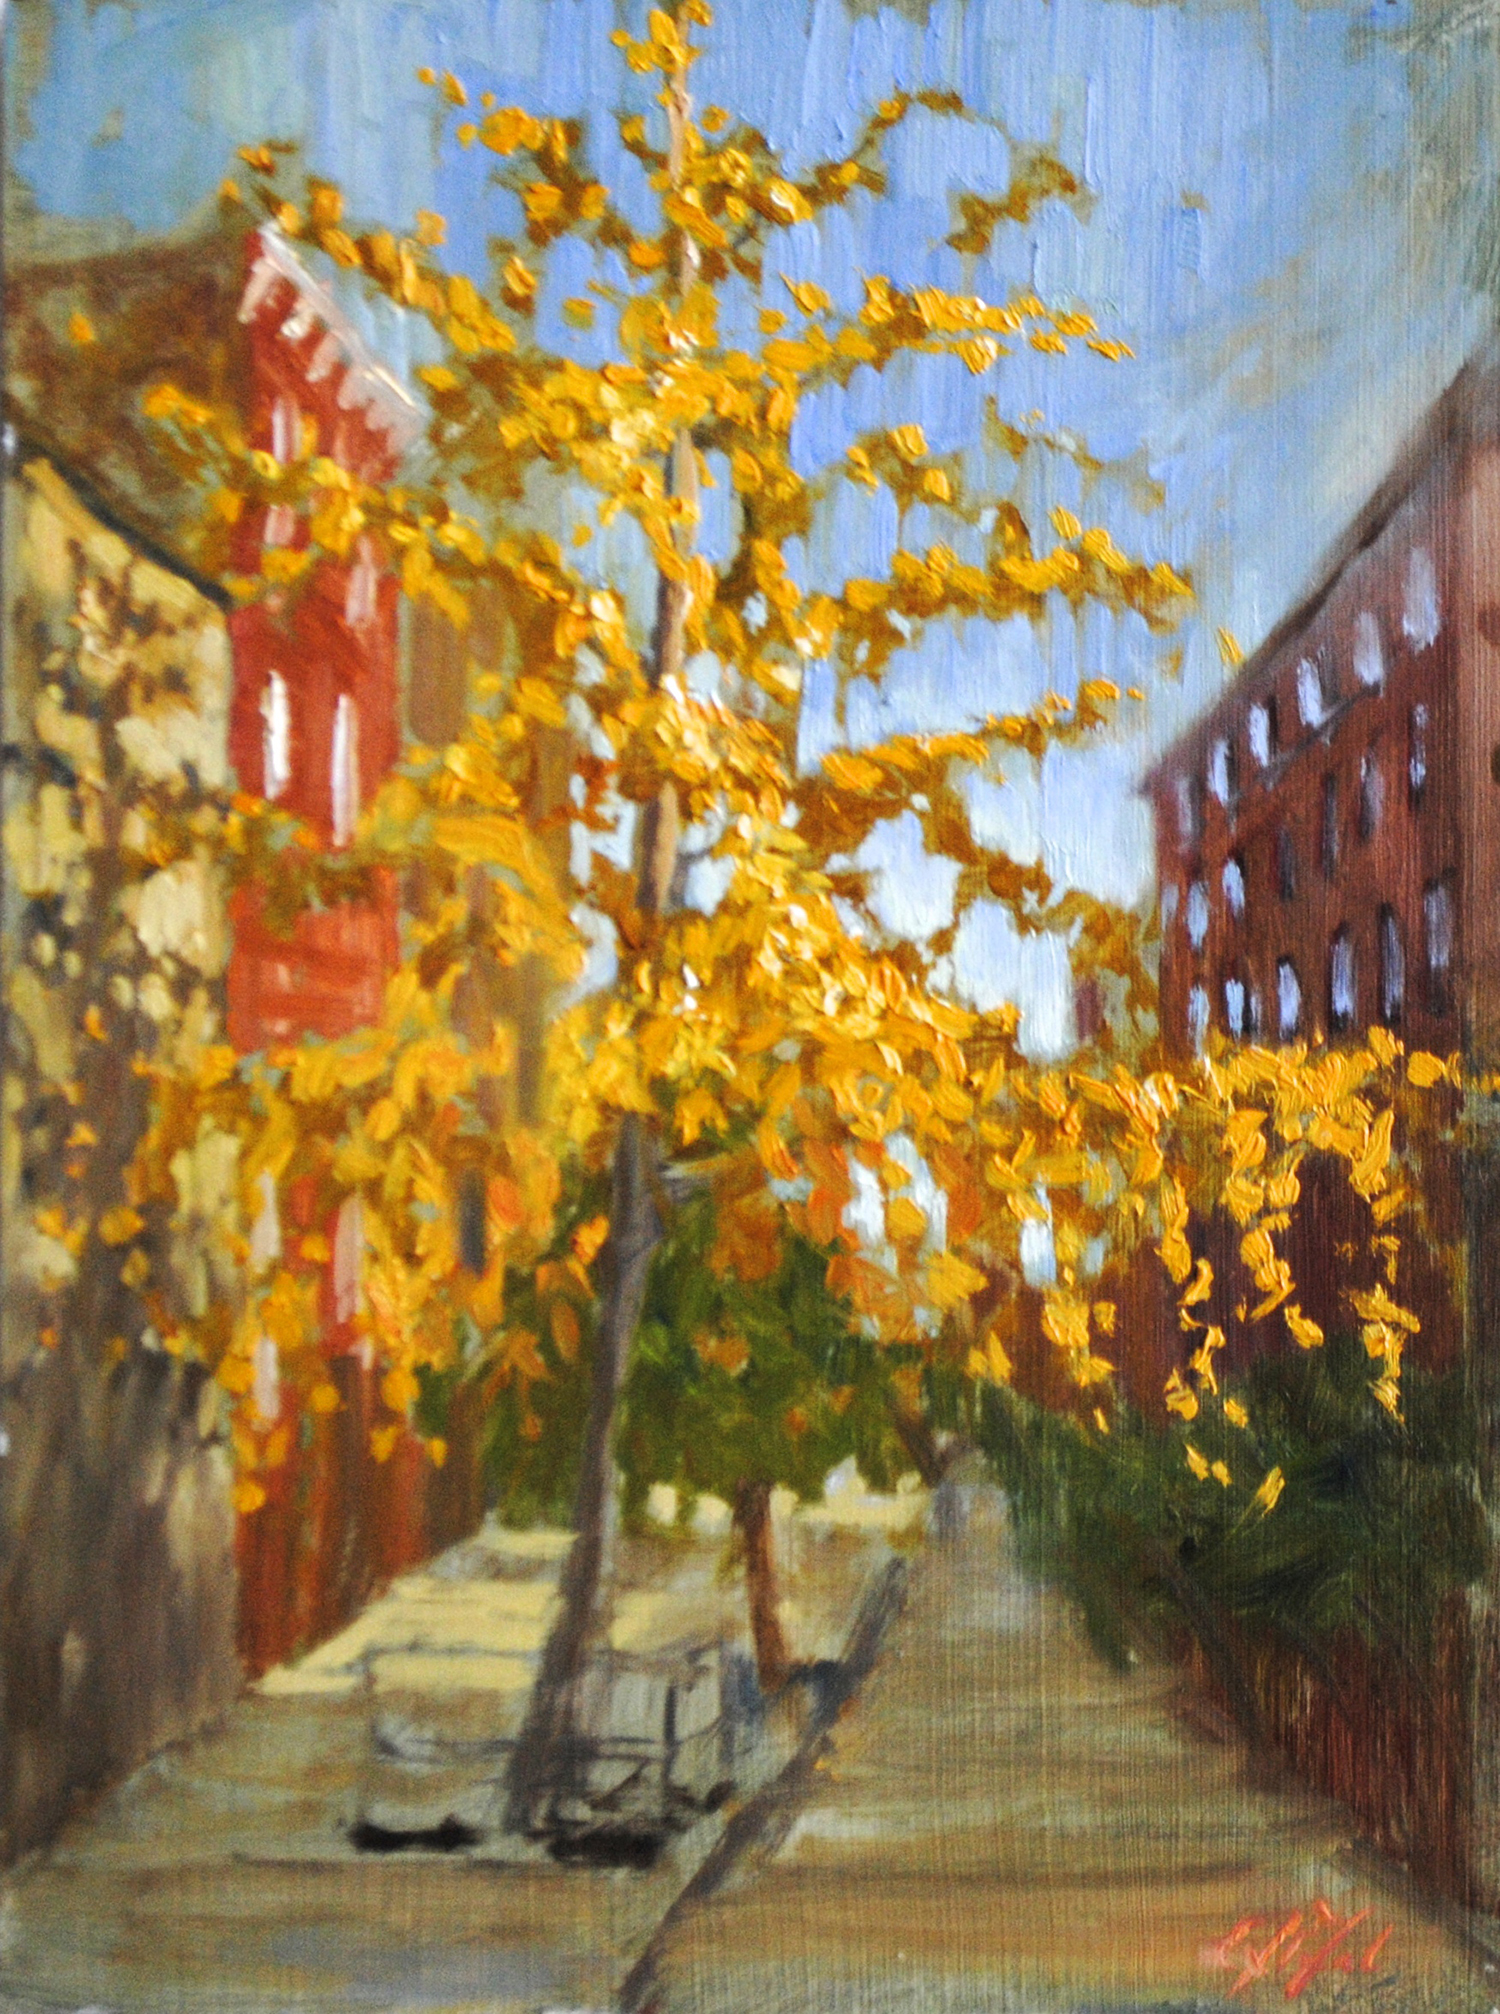 W-NITC-Village Gingko-Dalrymple-12x16-oil on canvas-2011-SOLD.jpg